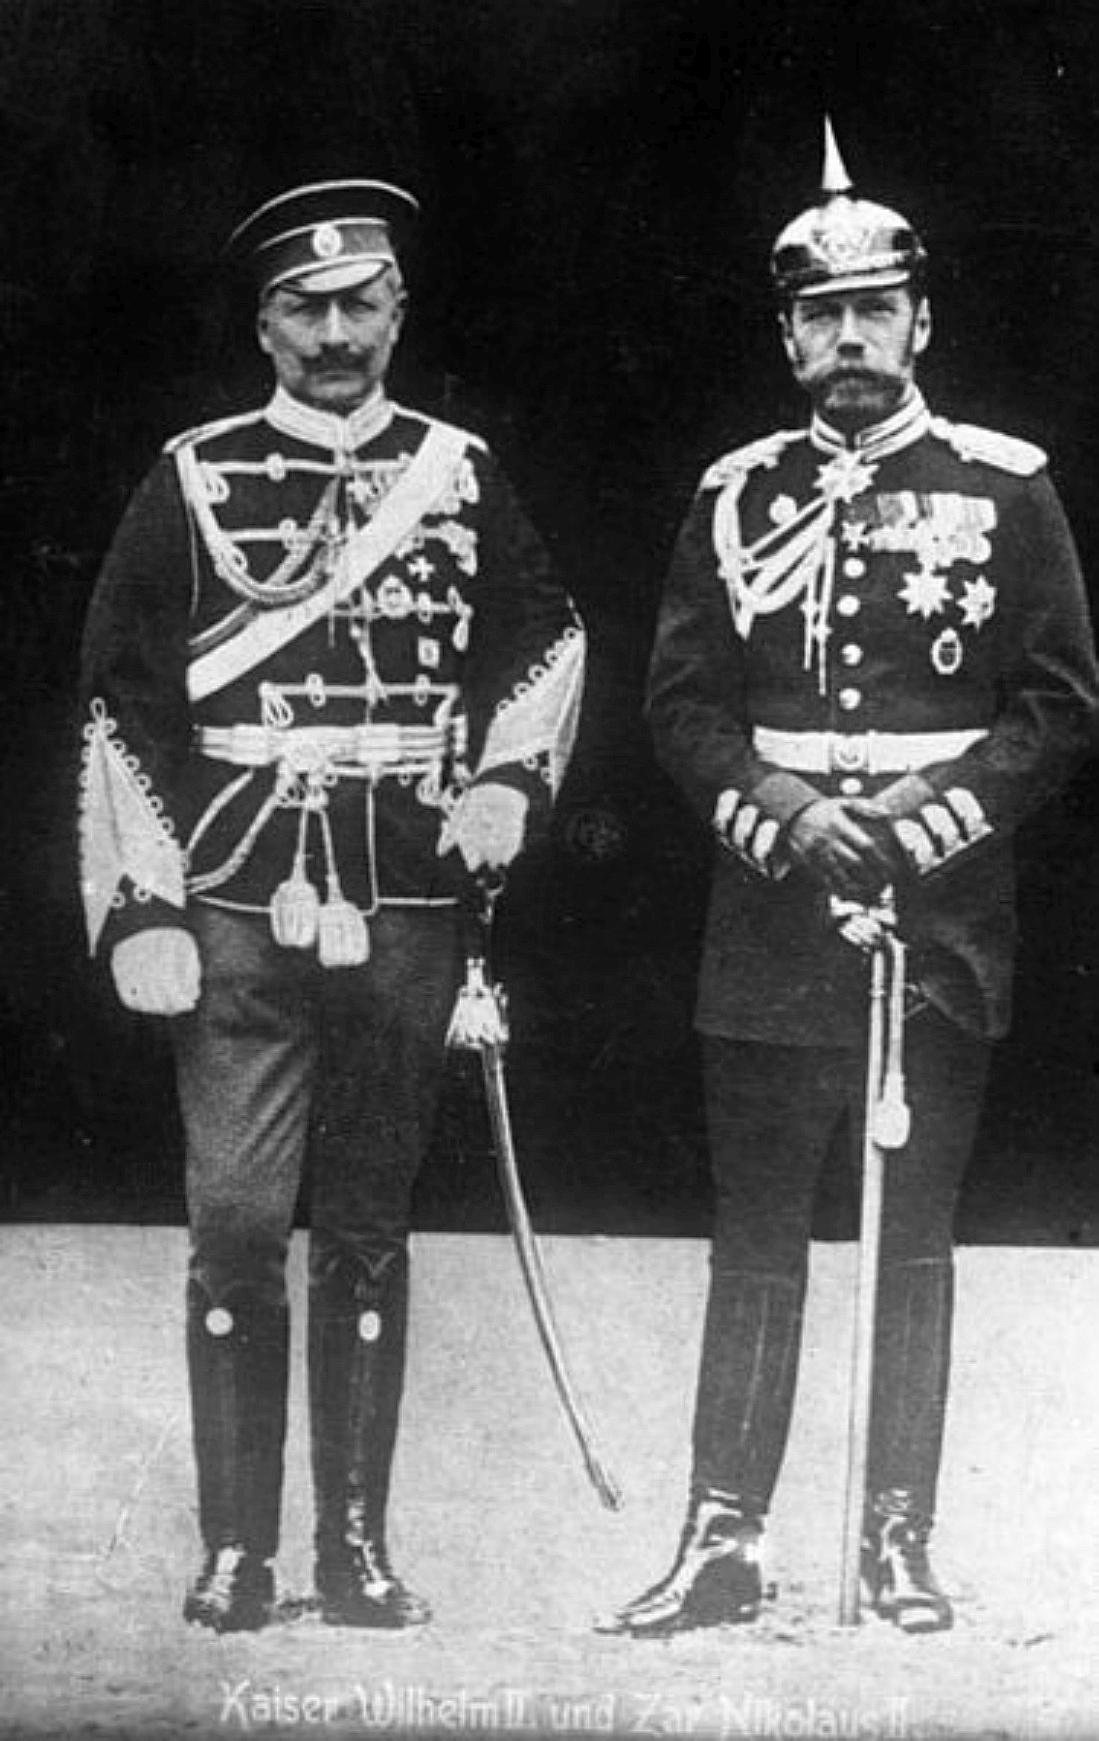 http://upload.wikimedia.org/wikipedia/commons/9/99/Bundesarchiv_Bild_183-R43302,_Kaiser_Wilhelm_II._und_Zar_Nikolaus_II..jpg